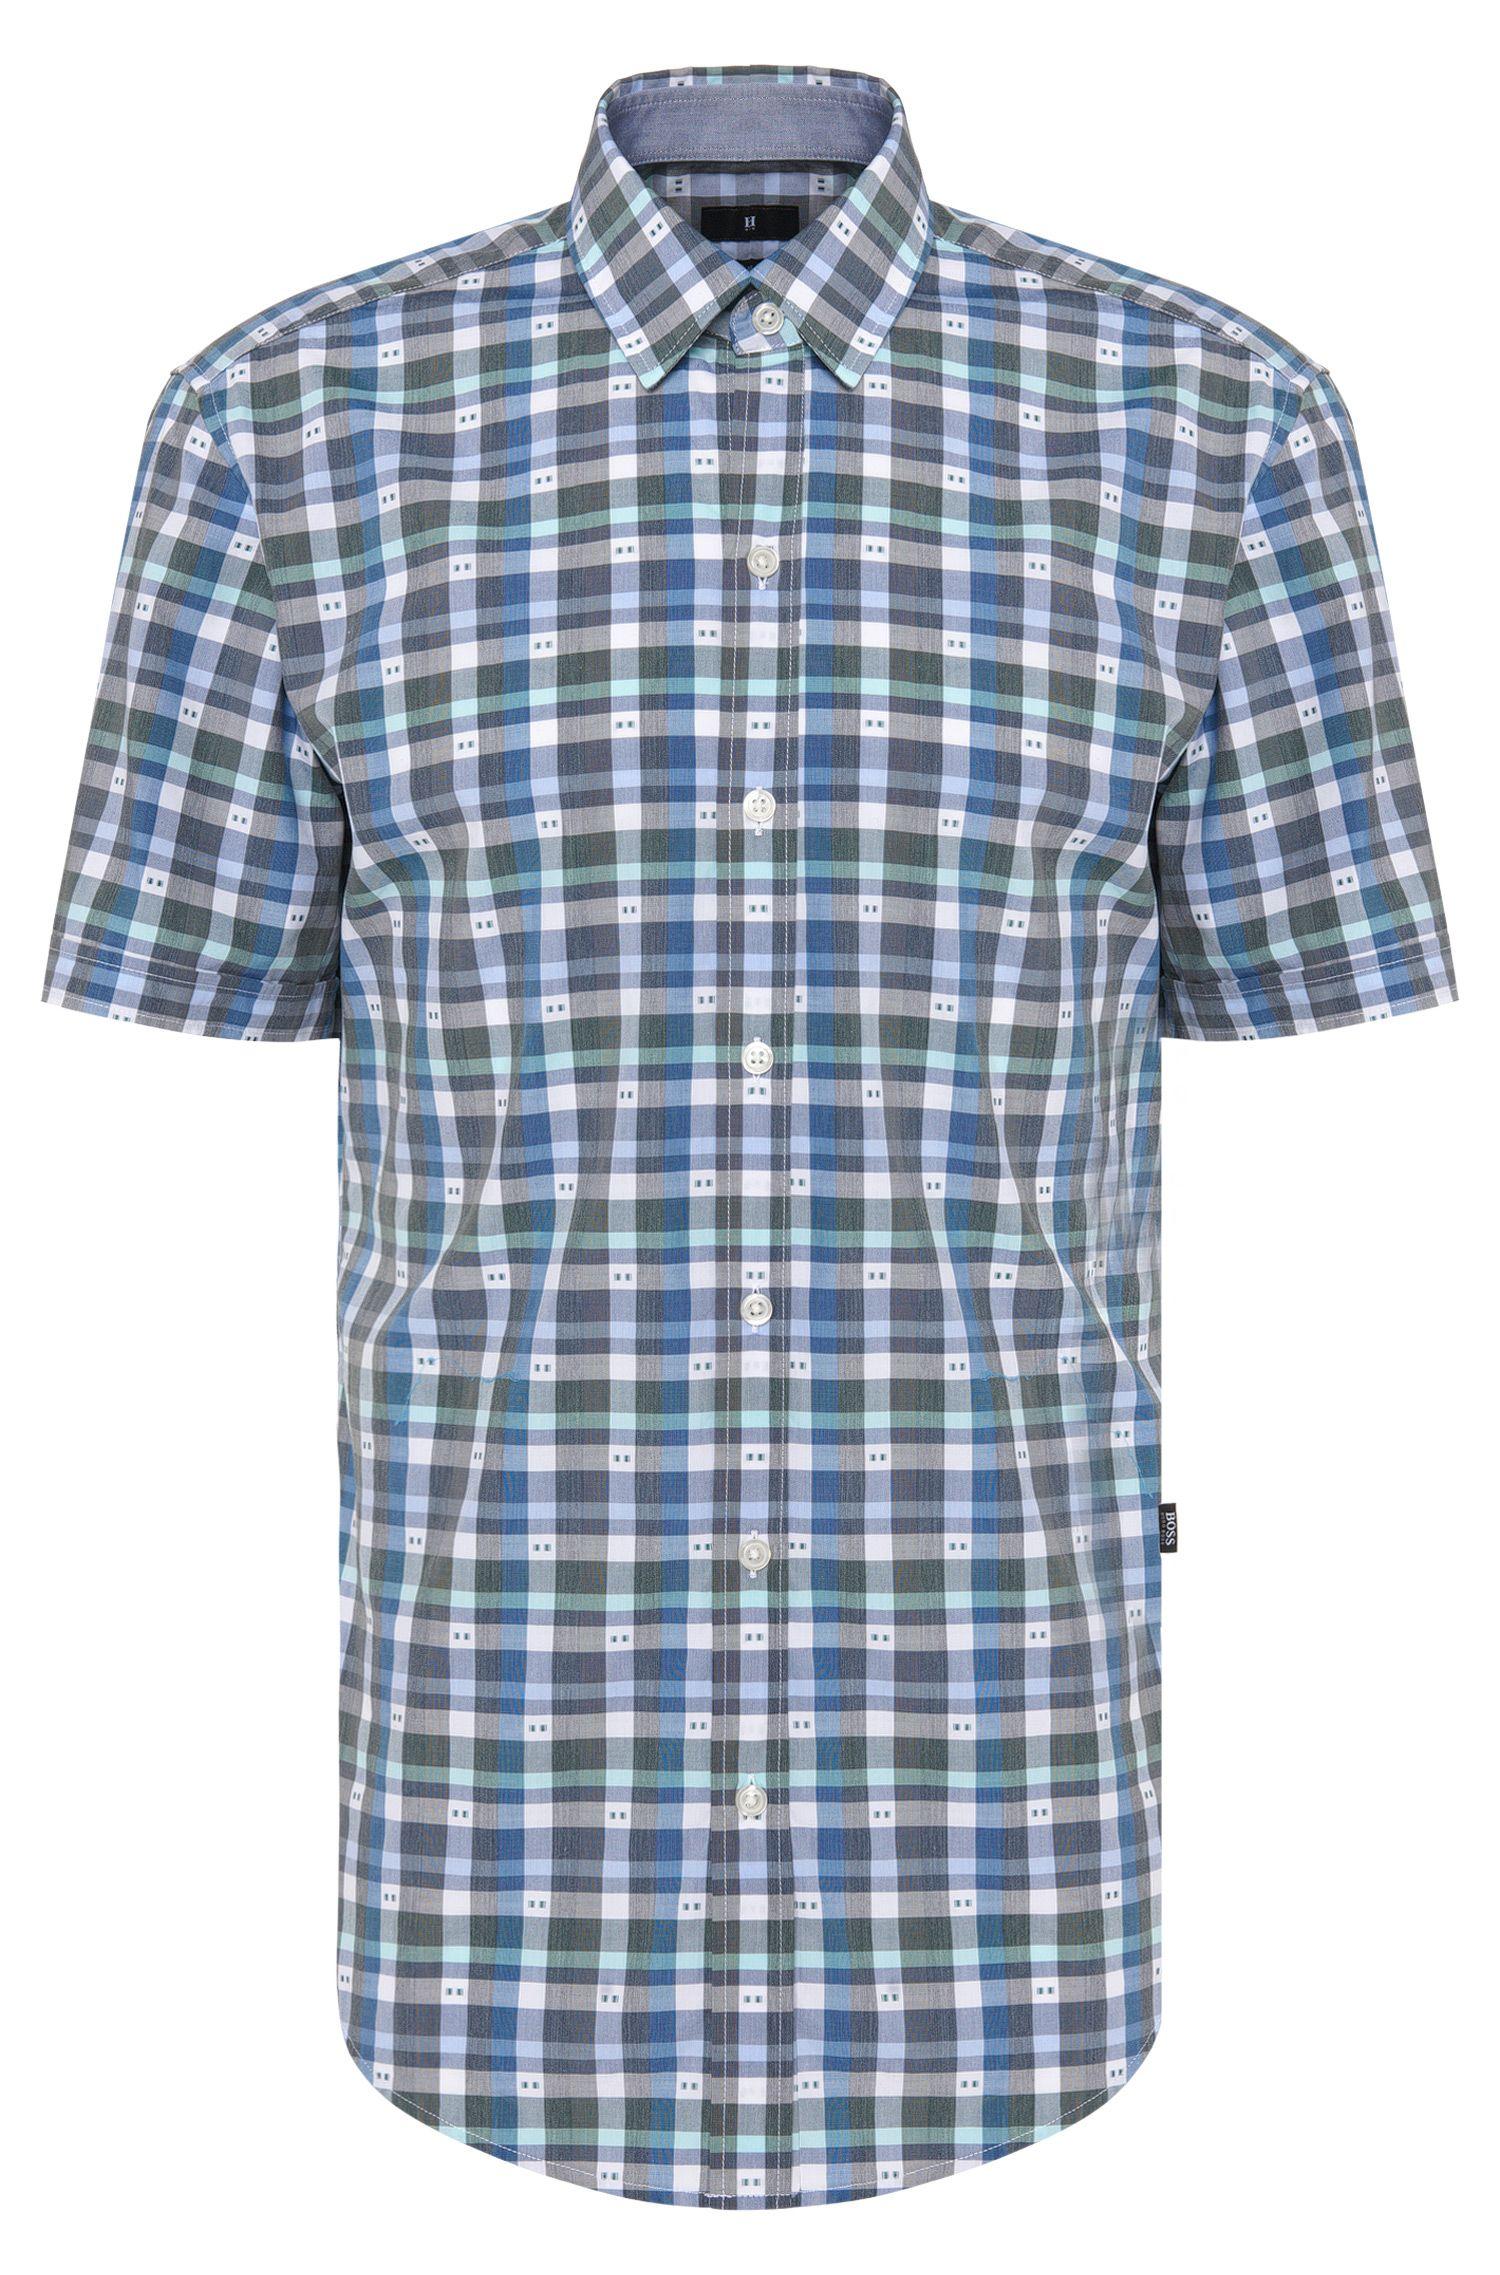 'Robb' | Slim Fit, Cotton Plaid Button Down Shirt